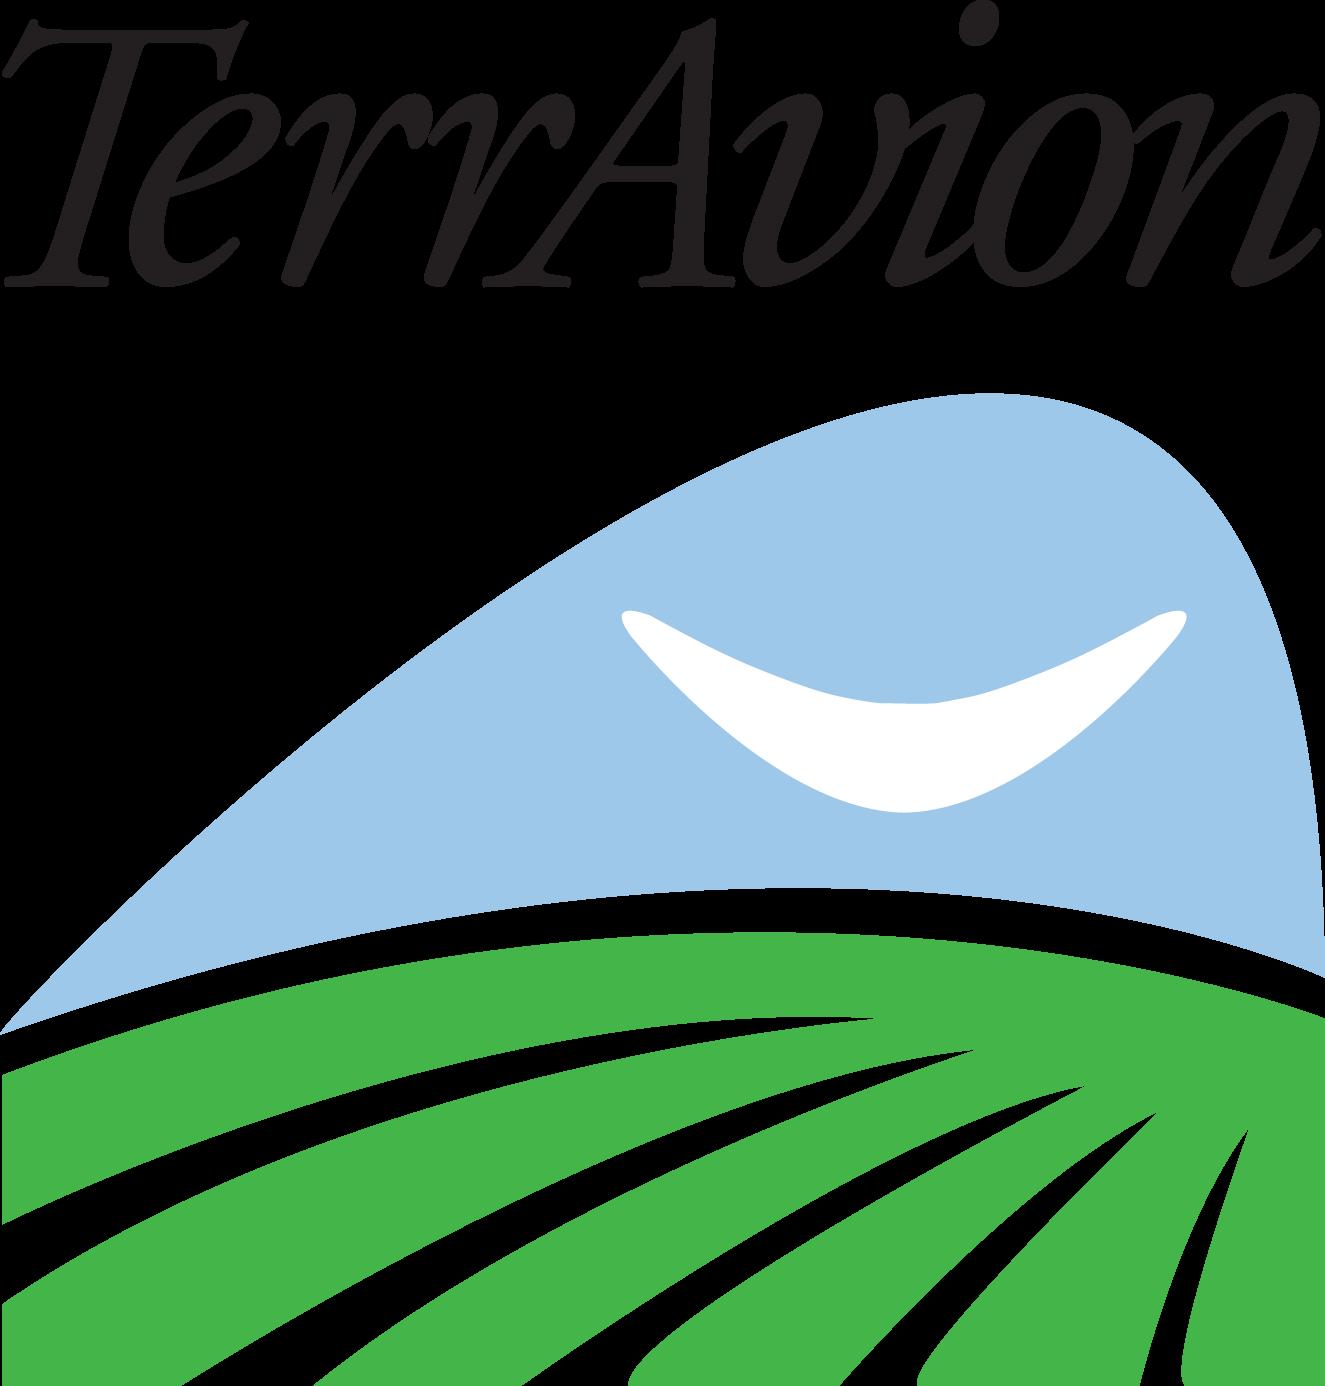 TerrAvion